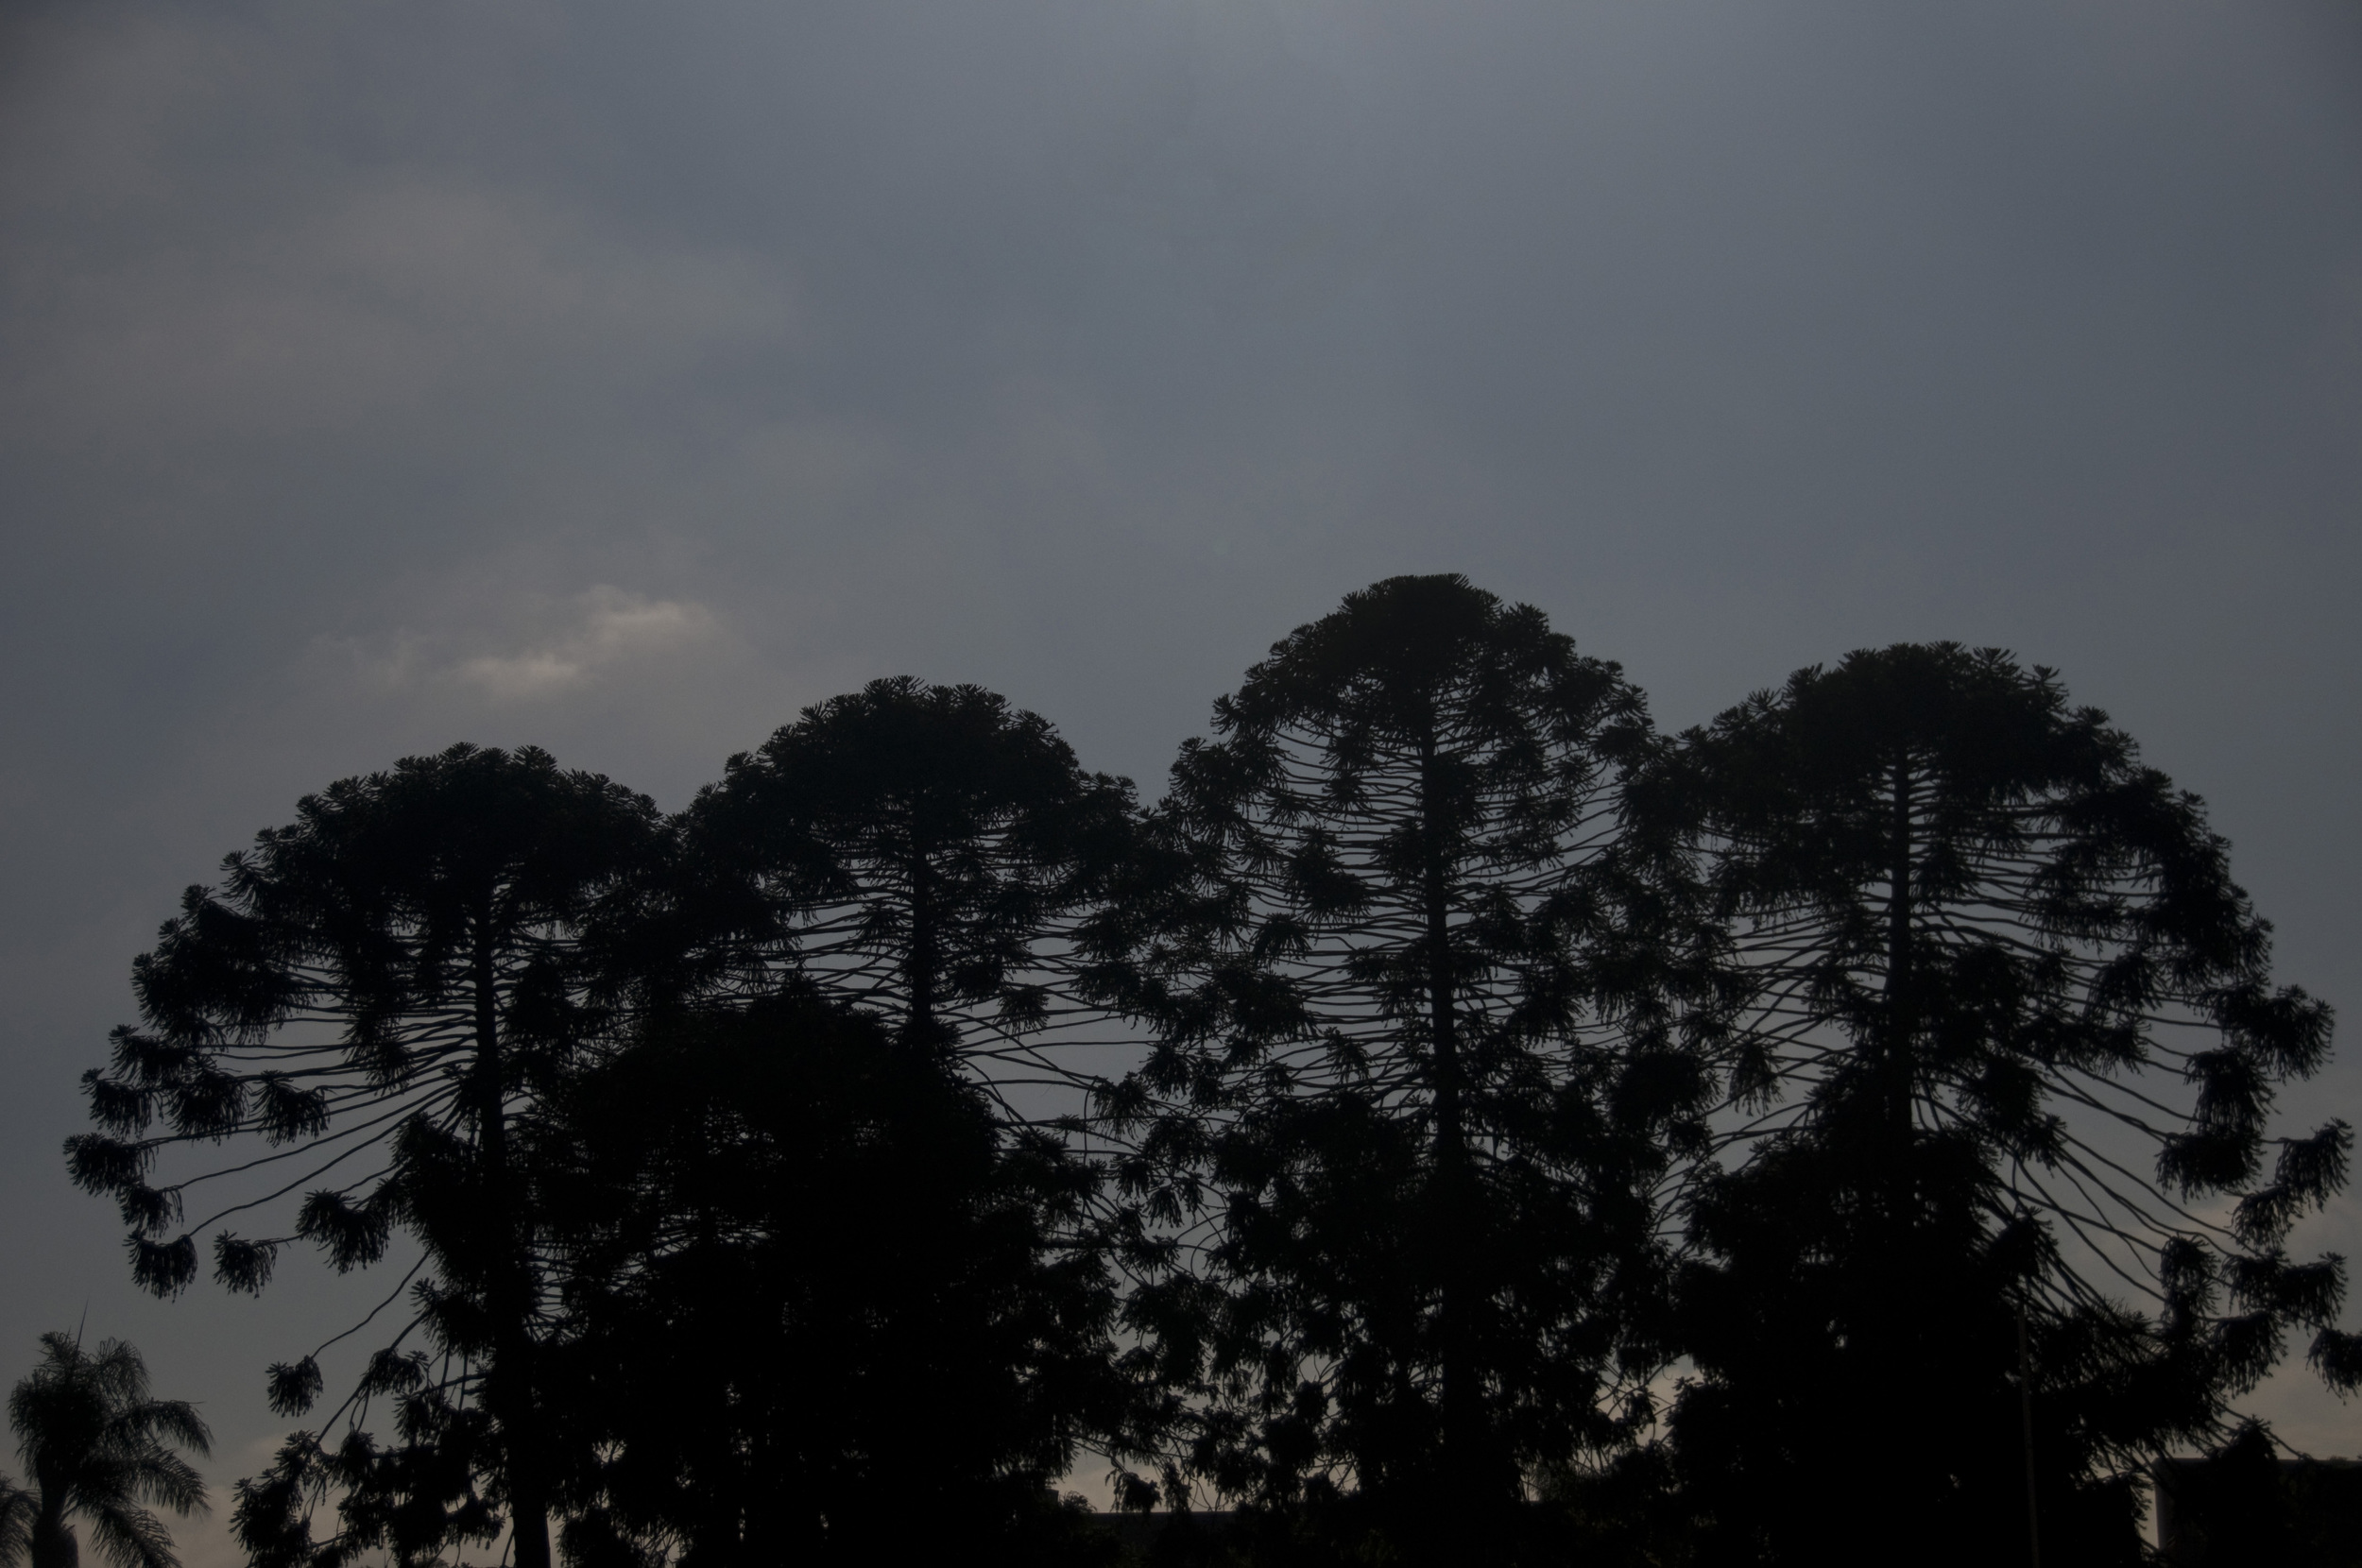 Balboa Park silhouette